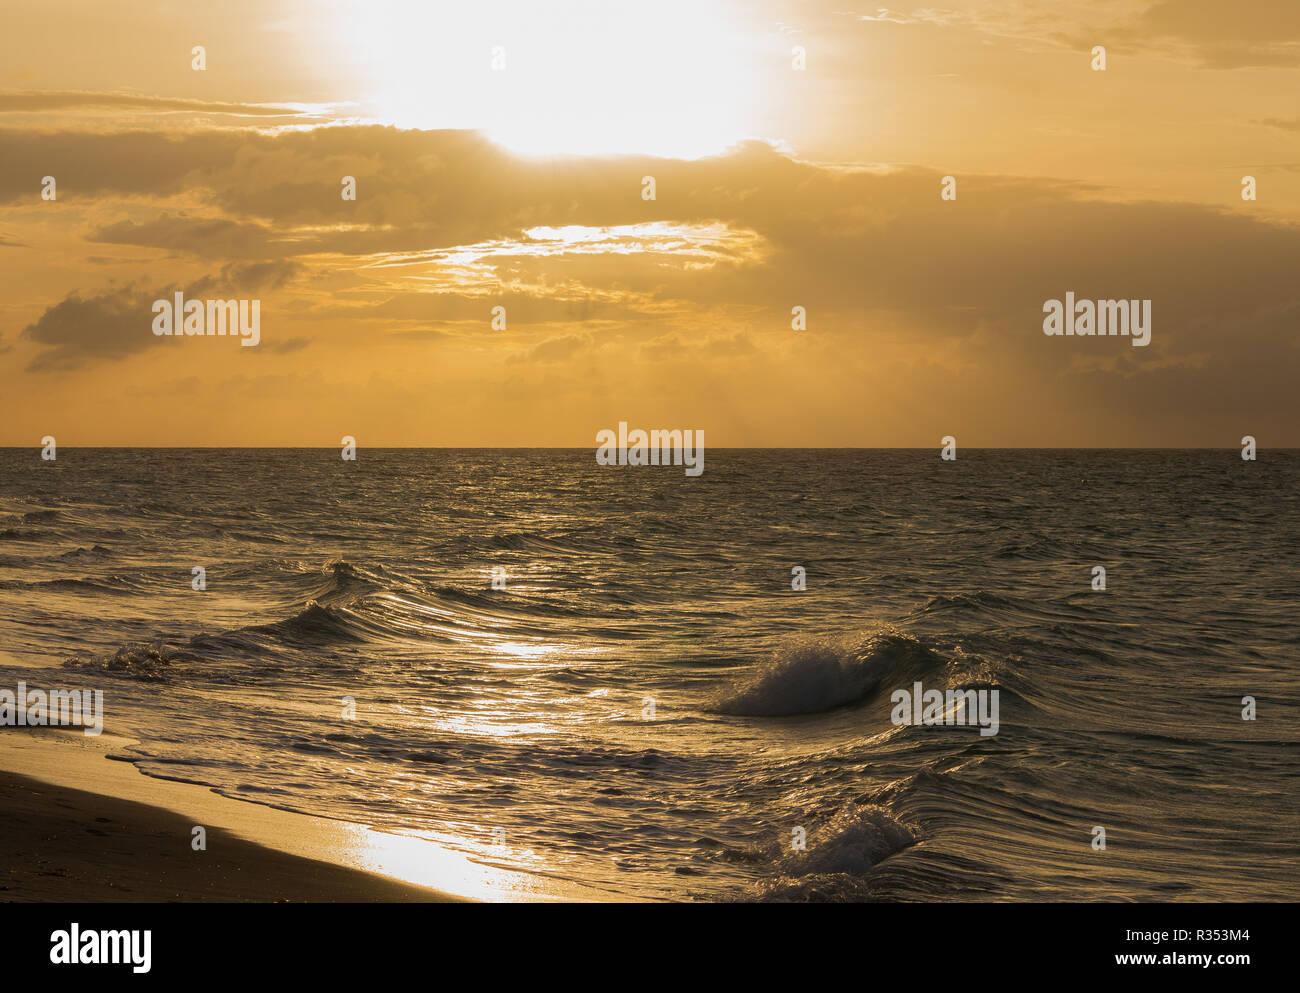 Cuba ocean view at sunset - Stock Image